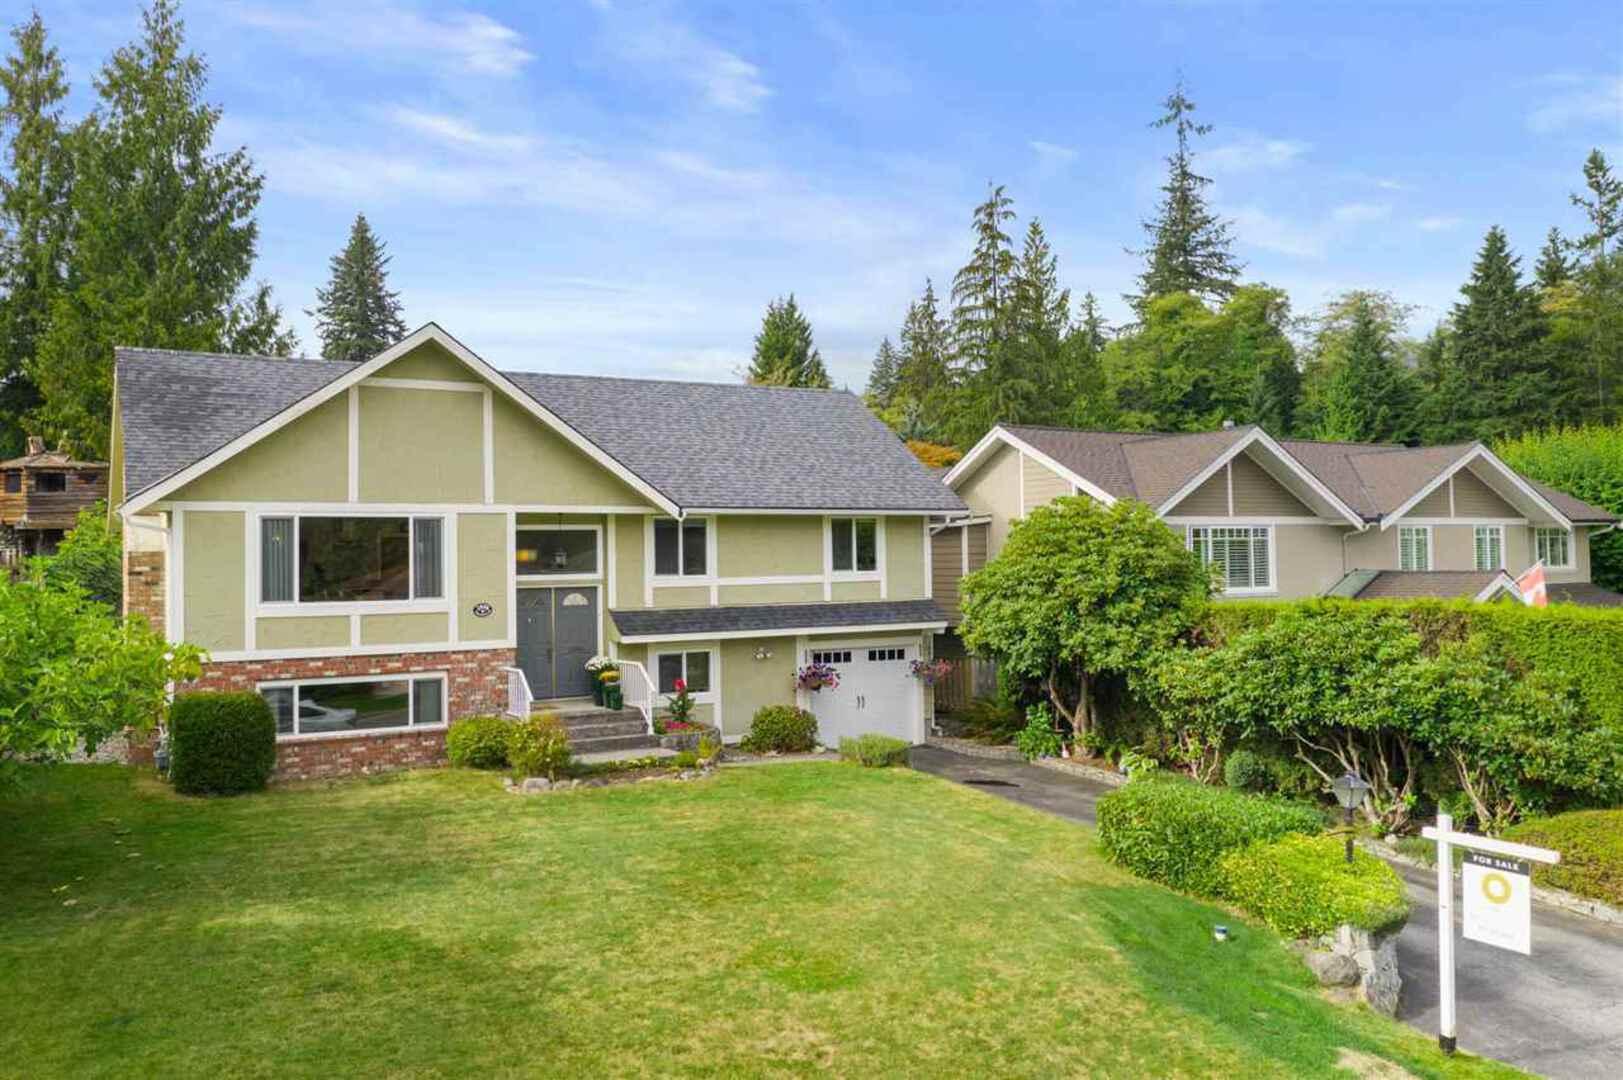 2808-trillium-place-blueridge-nv-north-vancouver-03 at 2808 Trillium Place, Blueridge NV, North Vancouver